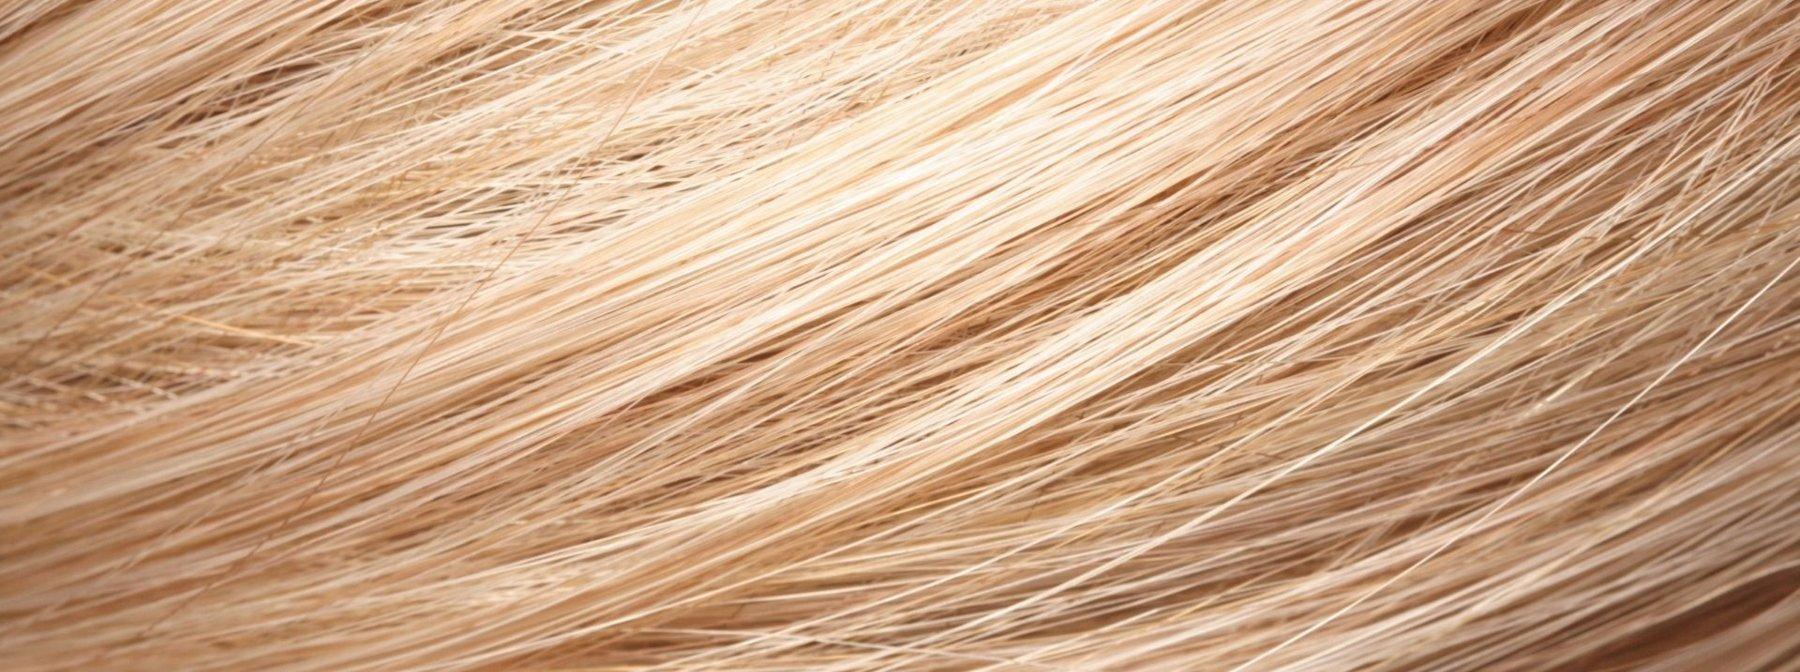 Bombshell Basics: How To Maintain Blonde Hair